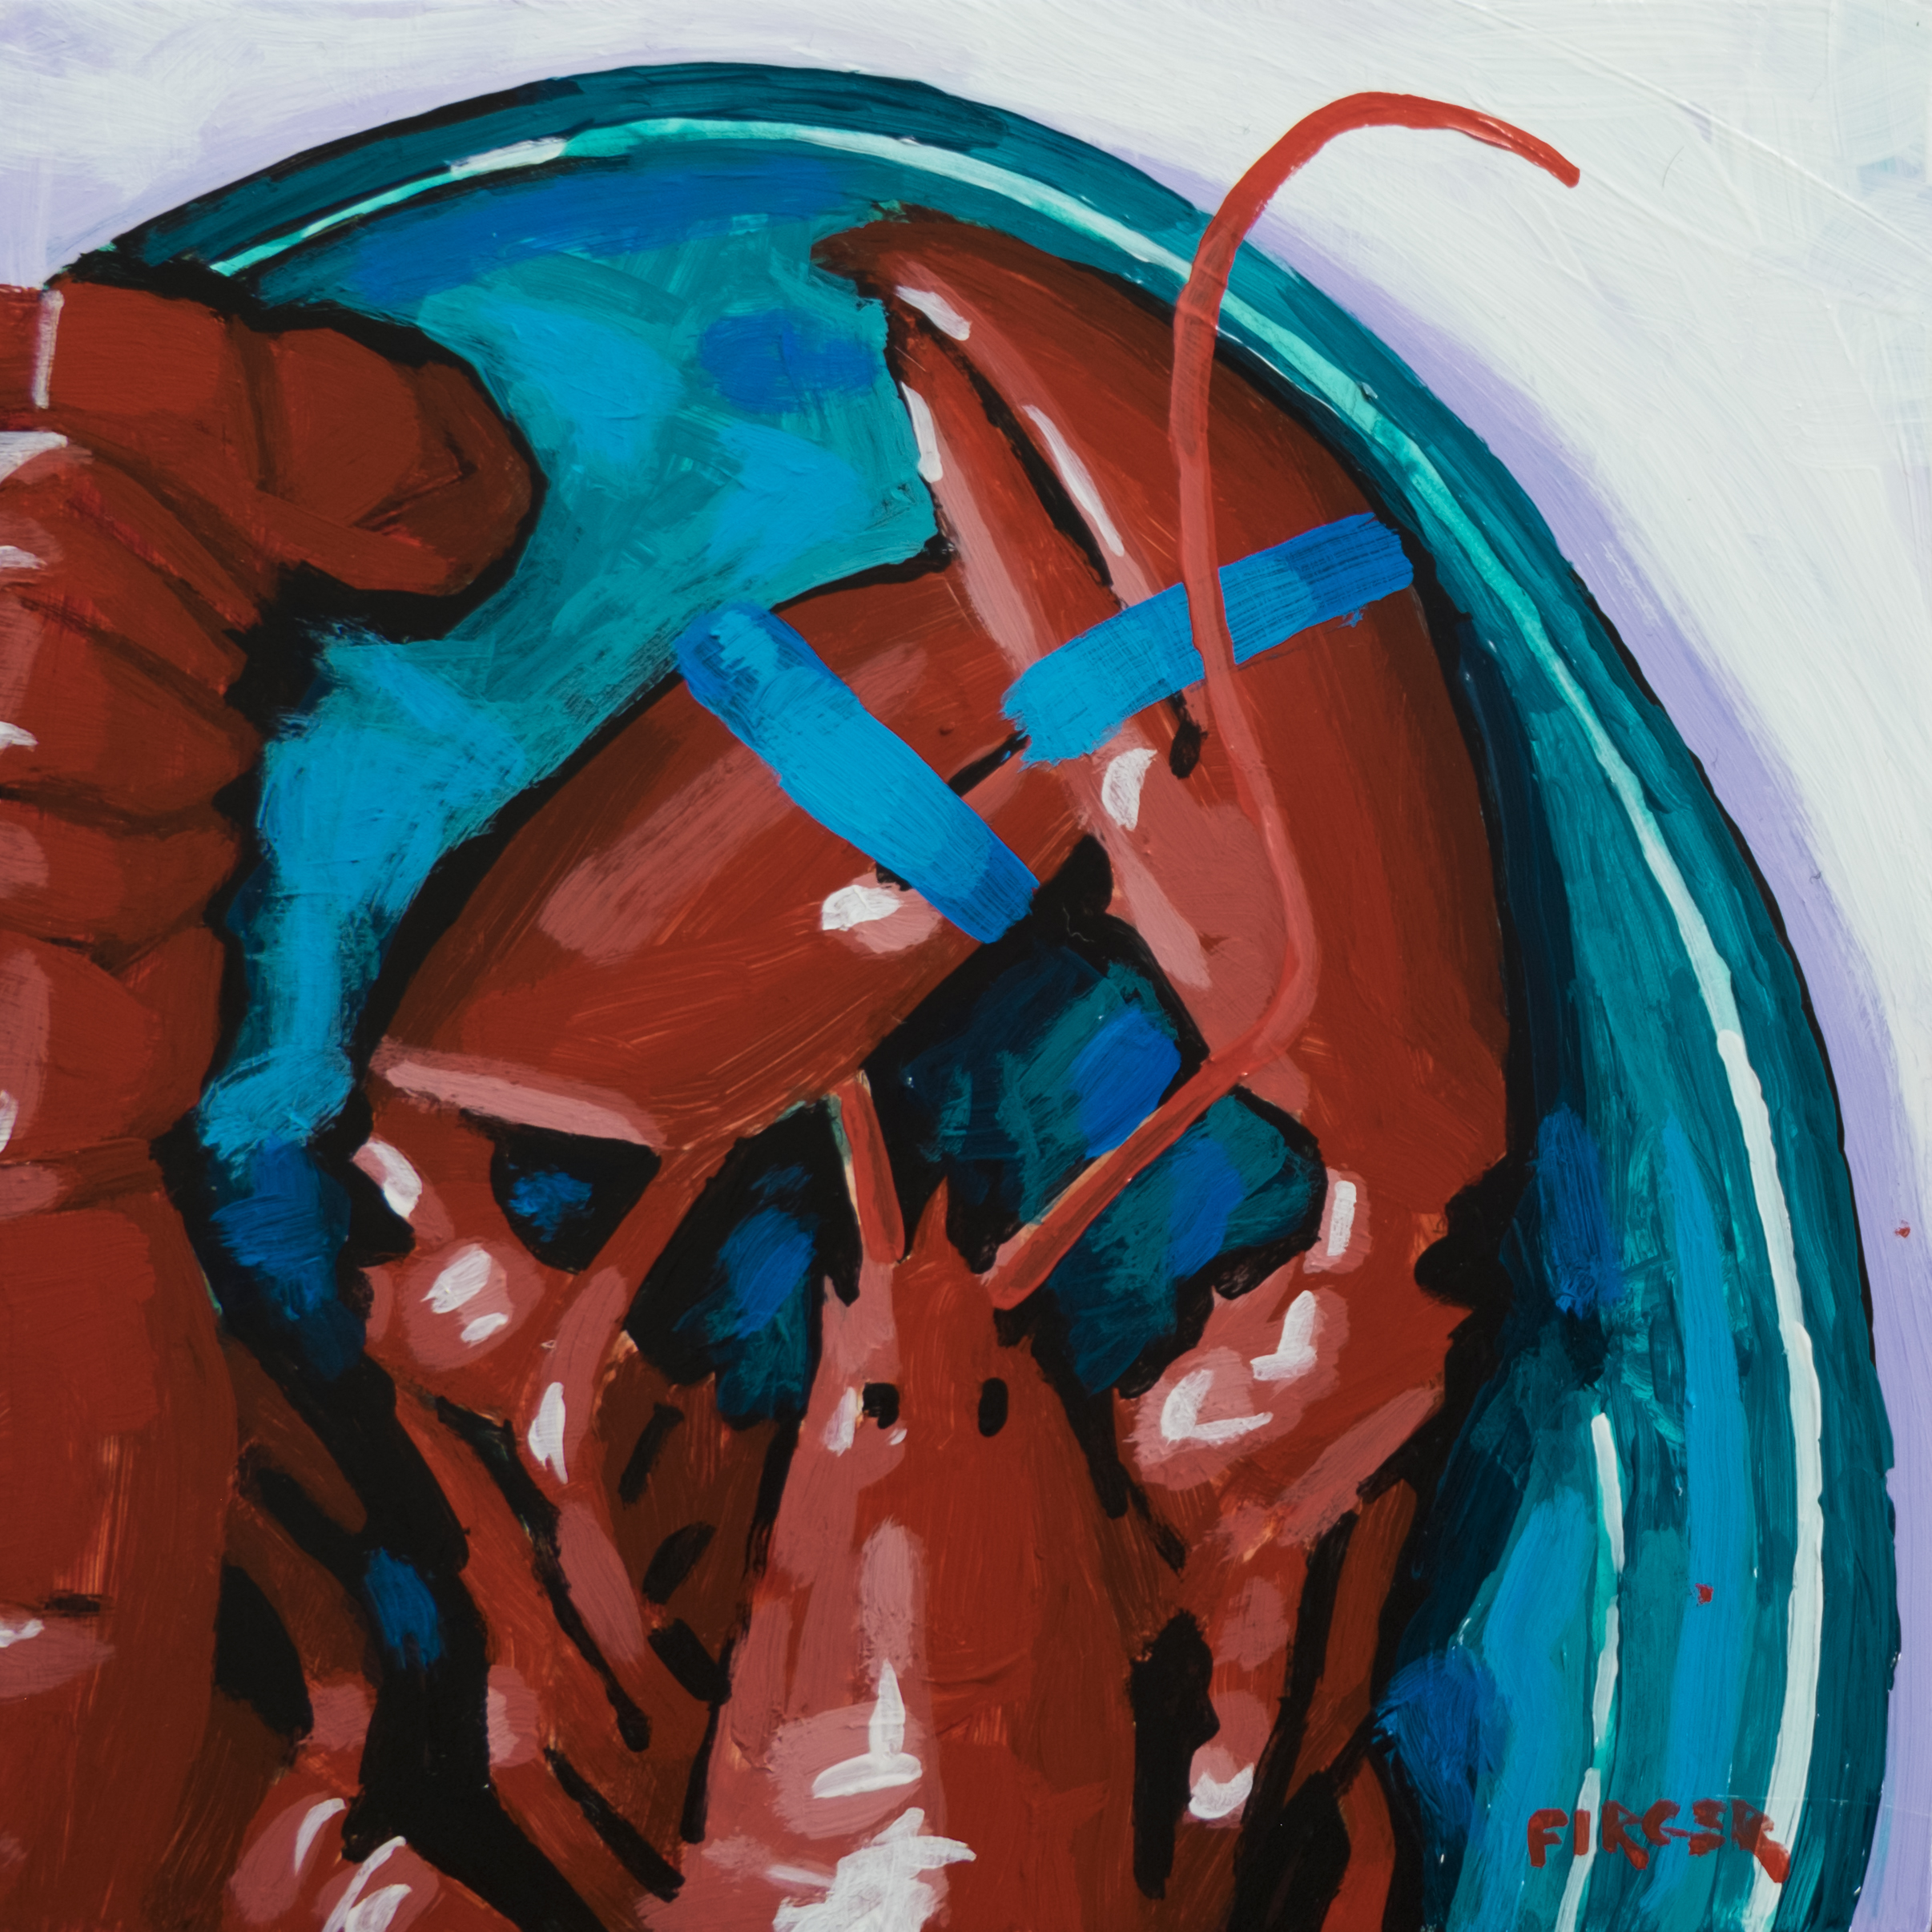 Dinner - 6 x 6, Acrylic on Panel (SOLD)